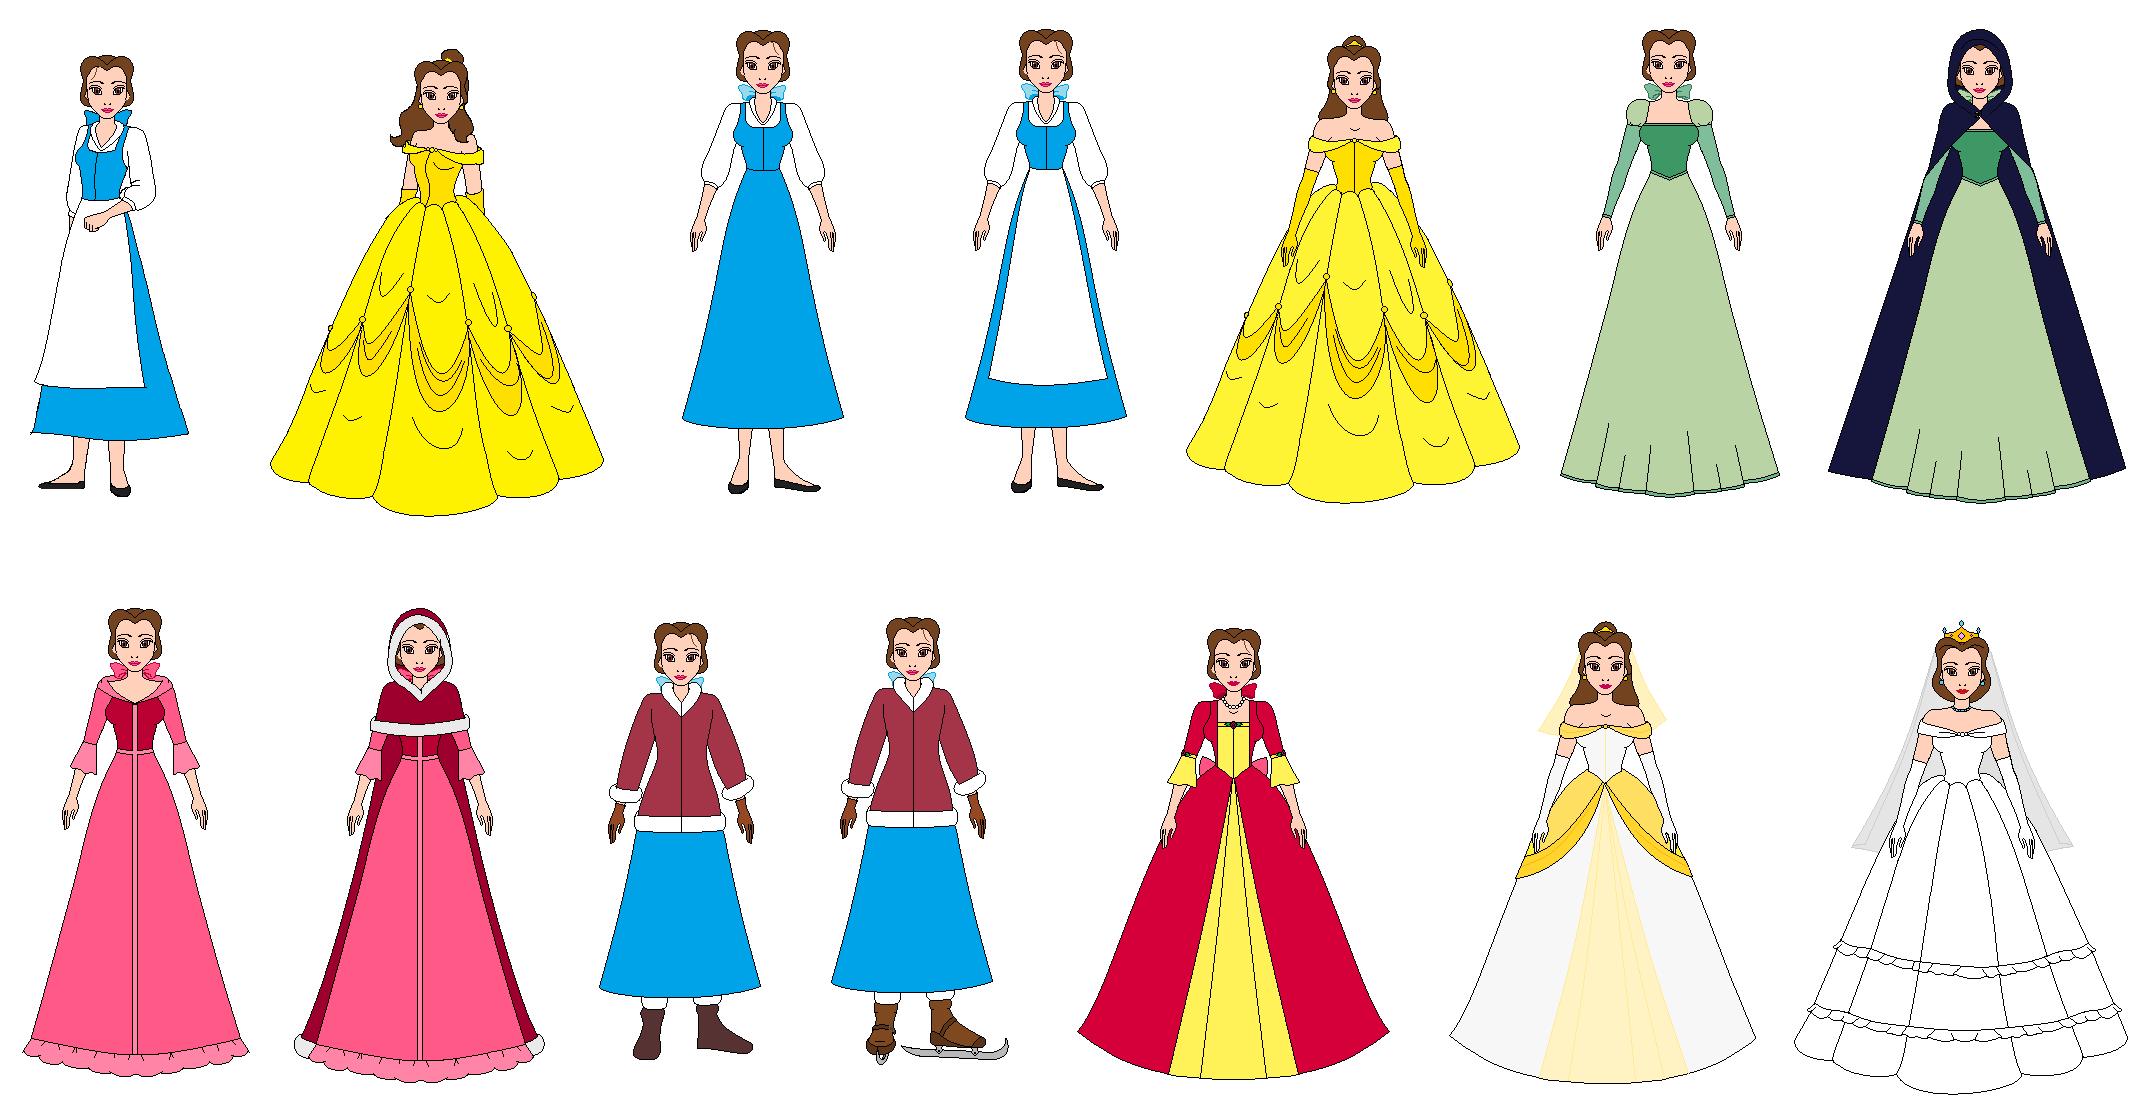 Belle dress clipart vector transparent stock Belle all Dress by PPsantos1989 on DeviantArt vector transparent stock